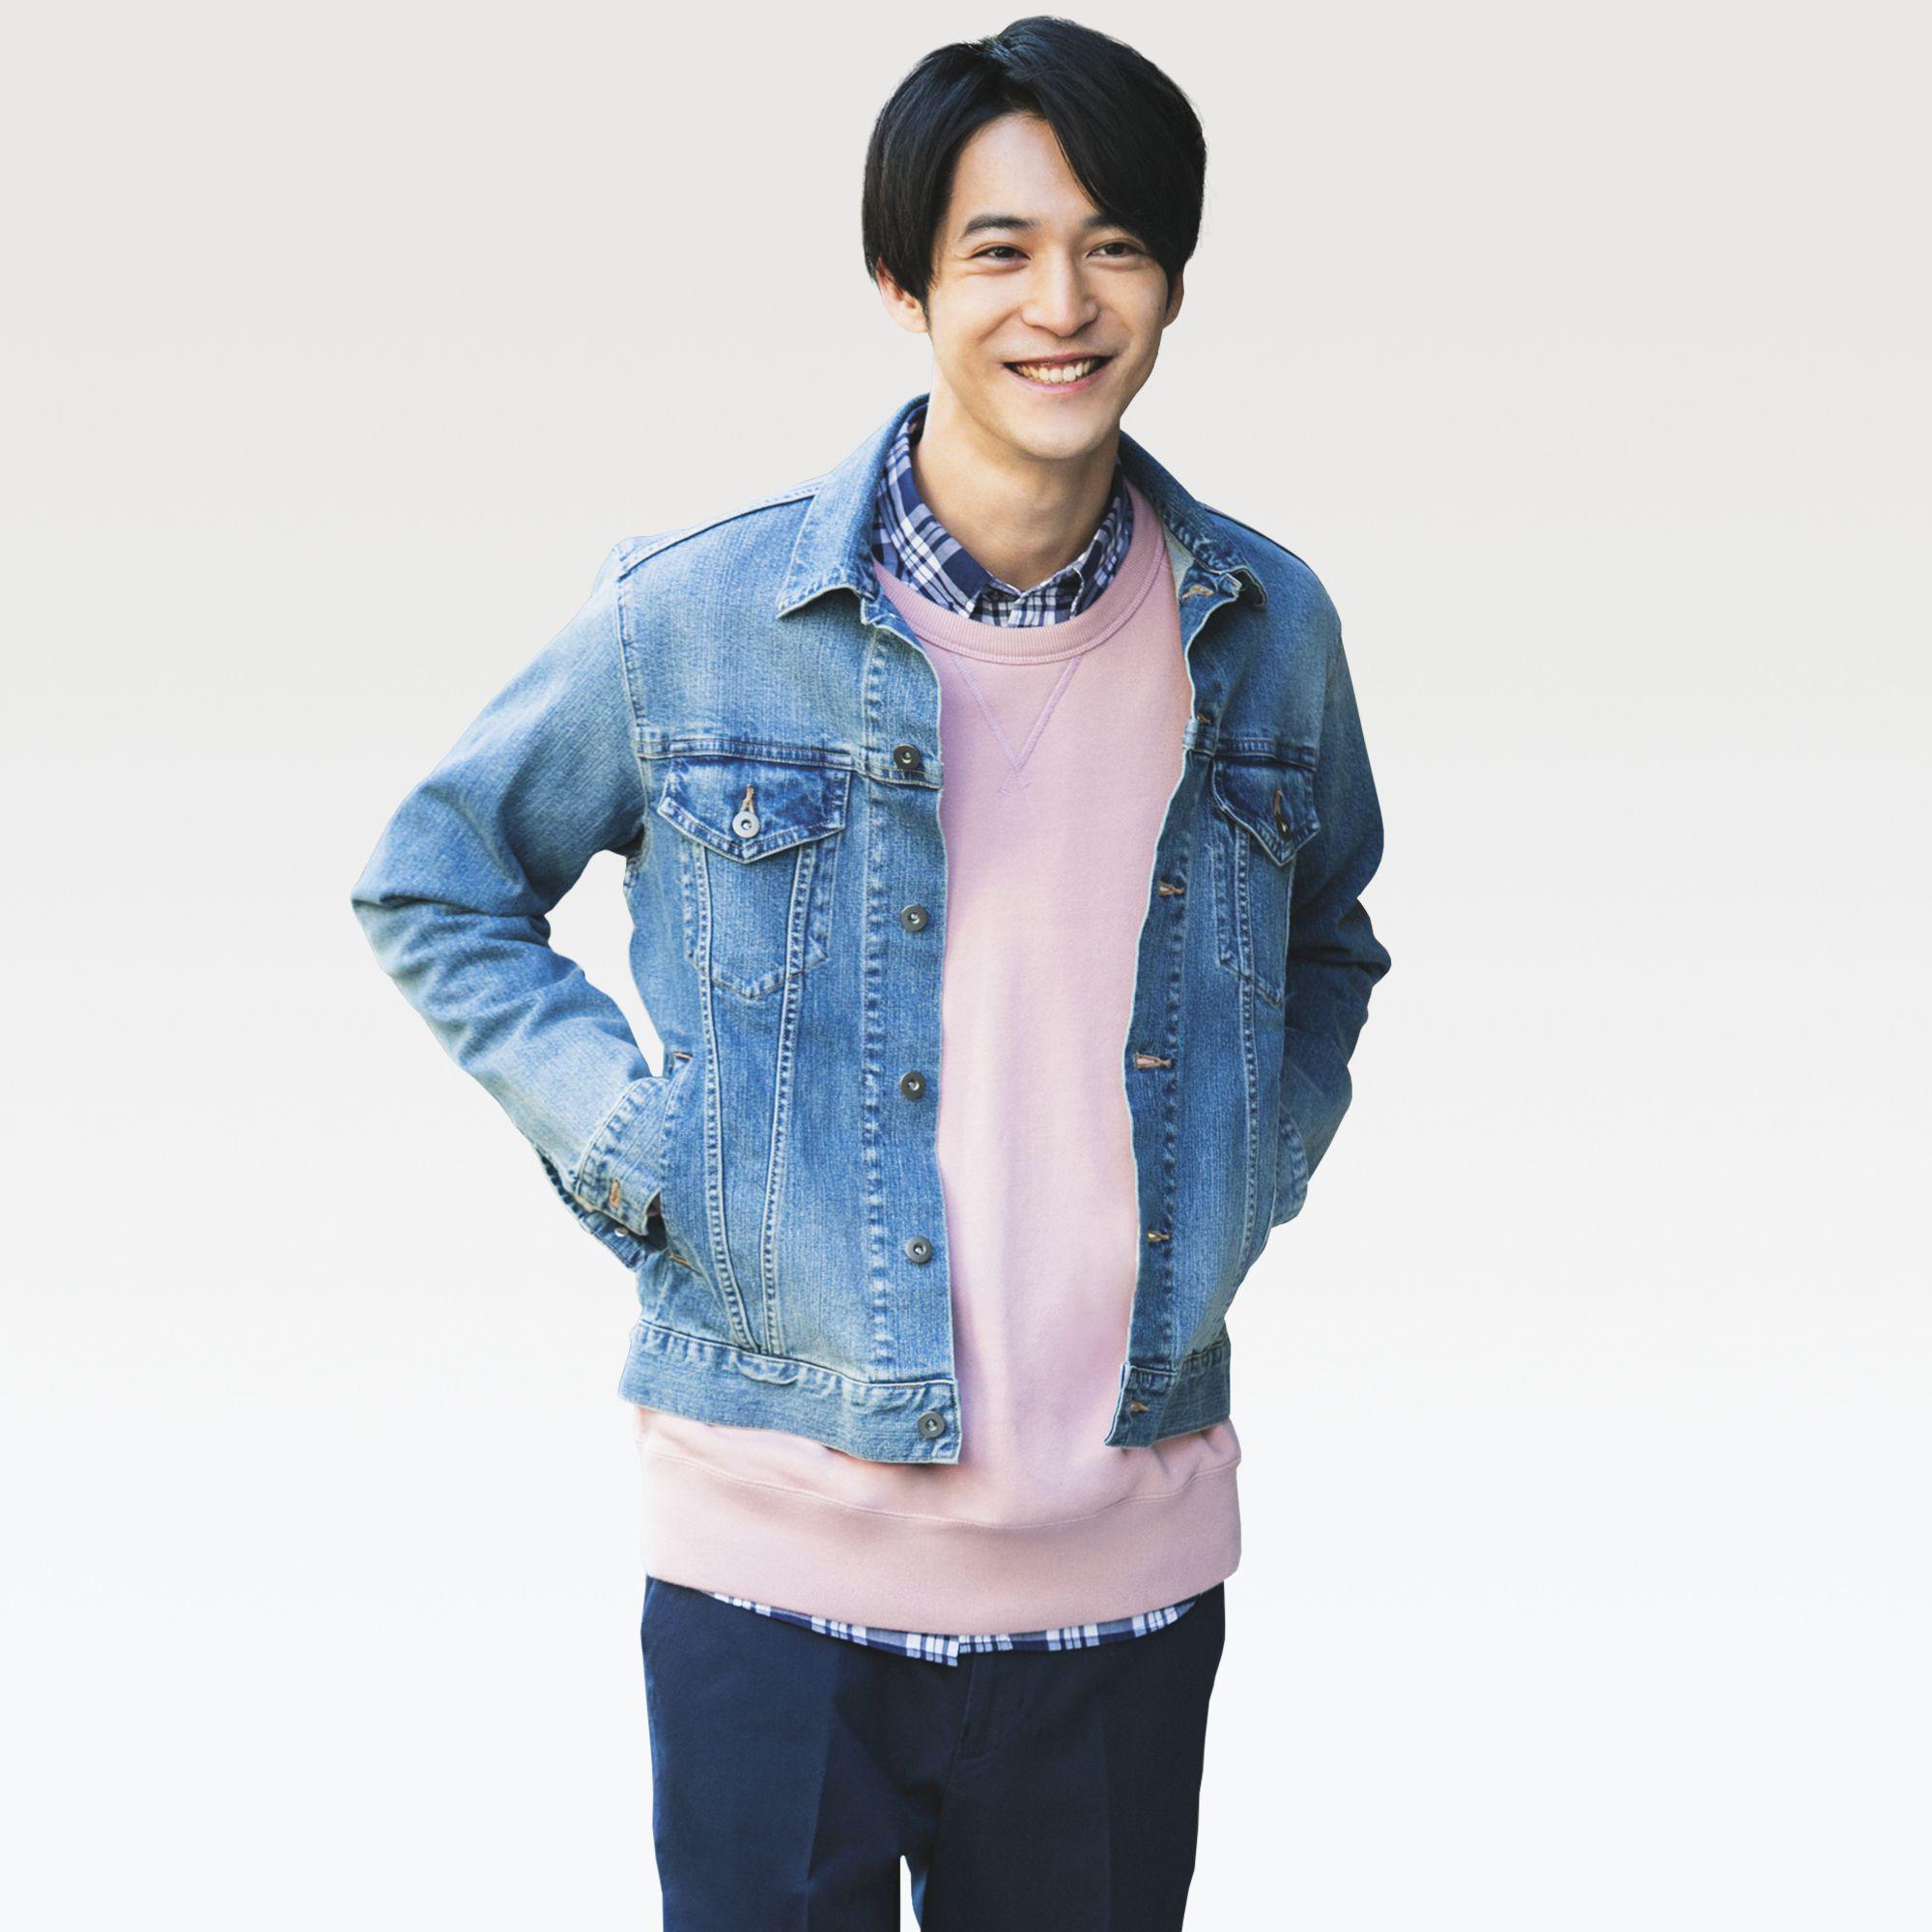 aa108d4a18 Uniqlo Denim Jacket in Blue for Men - Lyst